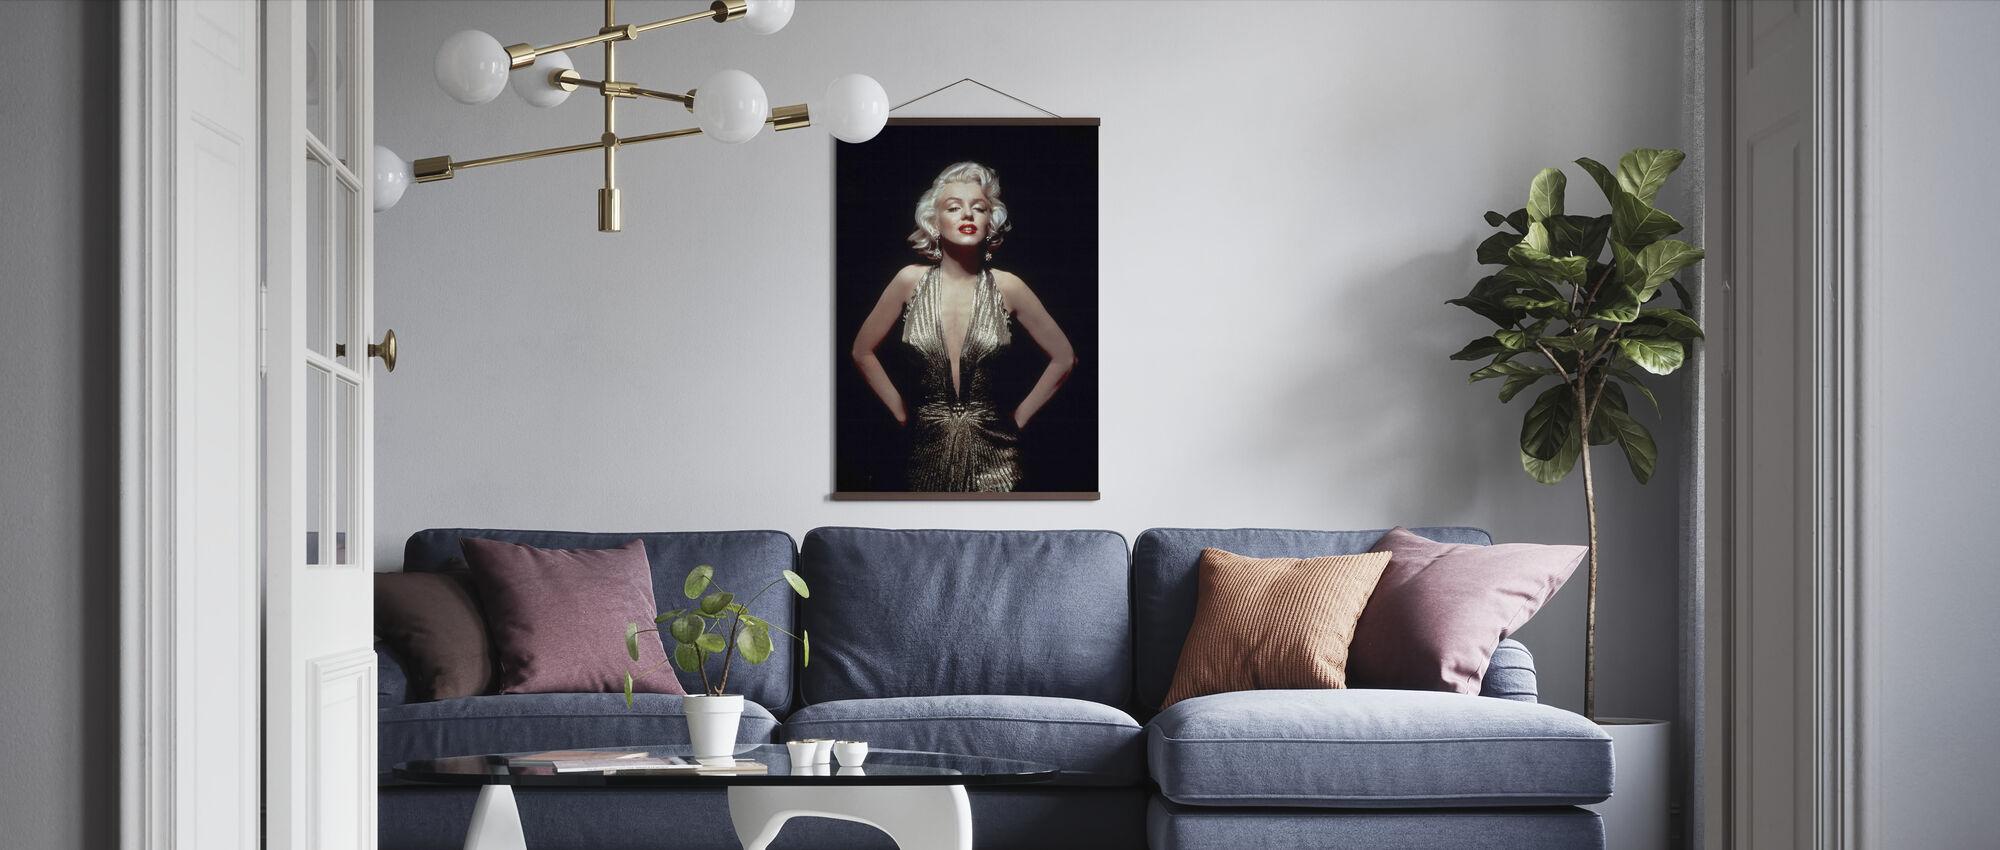 Marilyn Monroe in Gentlemen Prefer Blondes - Poster - Living Room